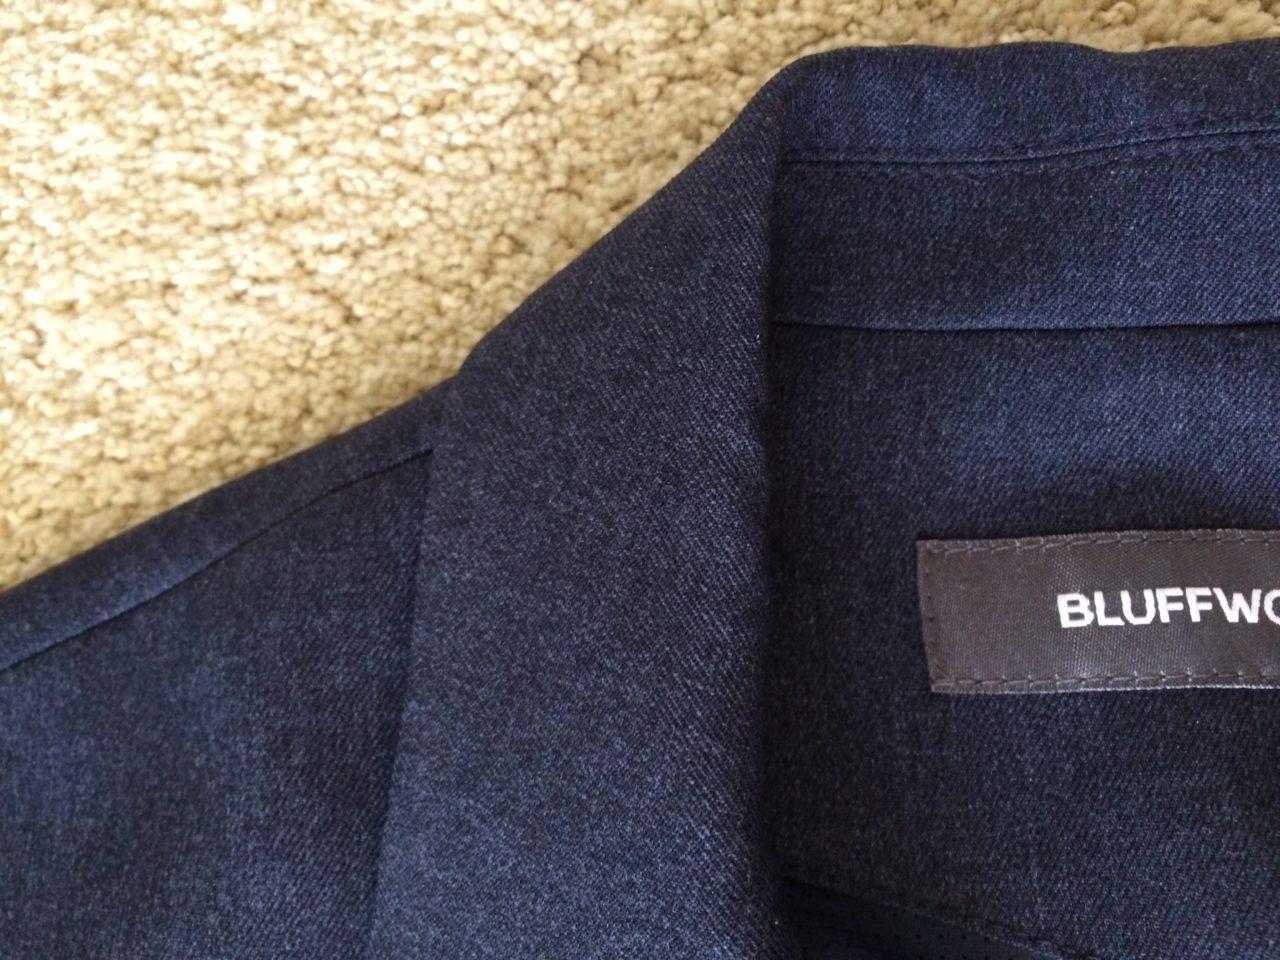 Bluffworks blazer collar close up